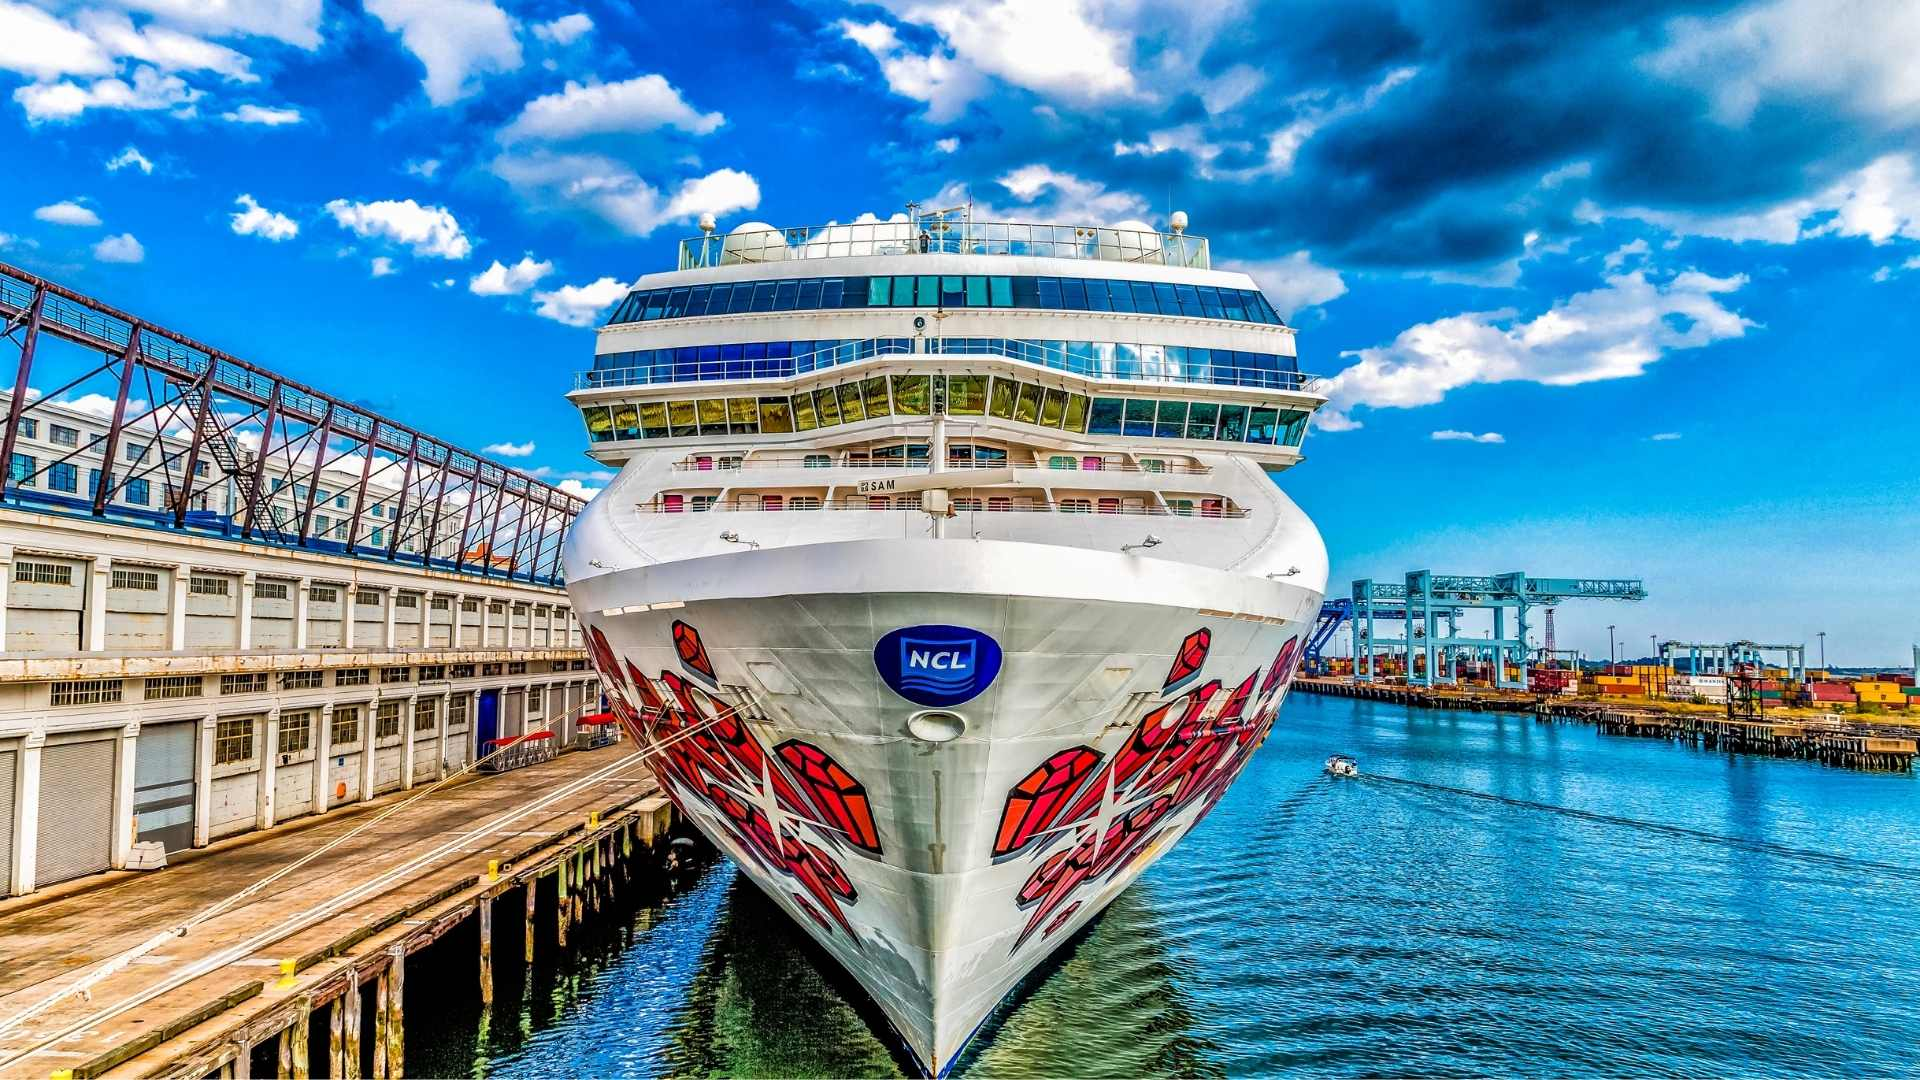 NCL Spring Break Cruise